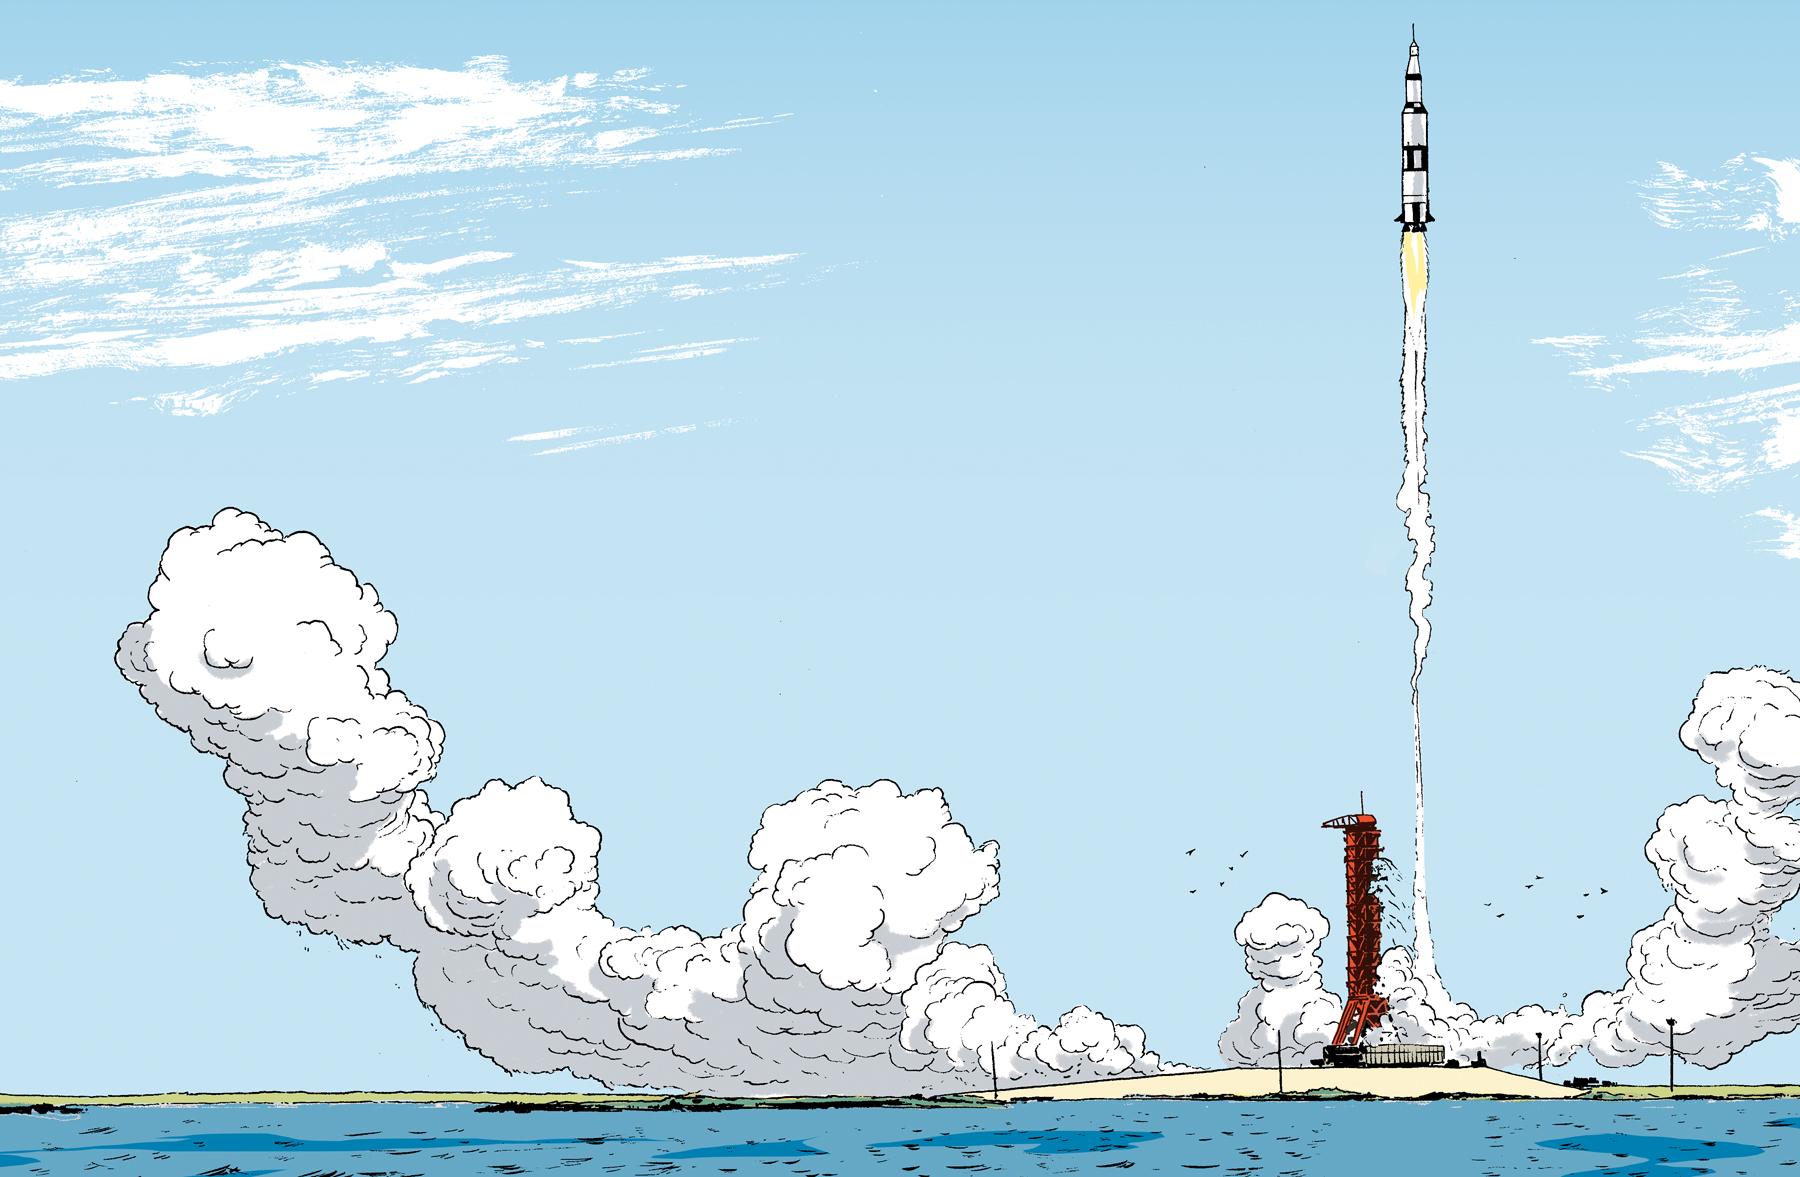 Illustration excerpt from  Moonbound